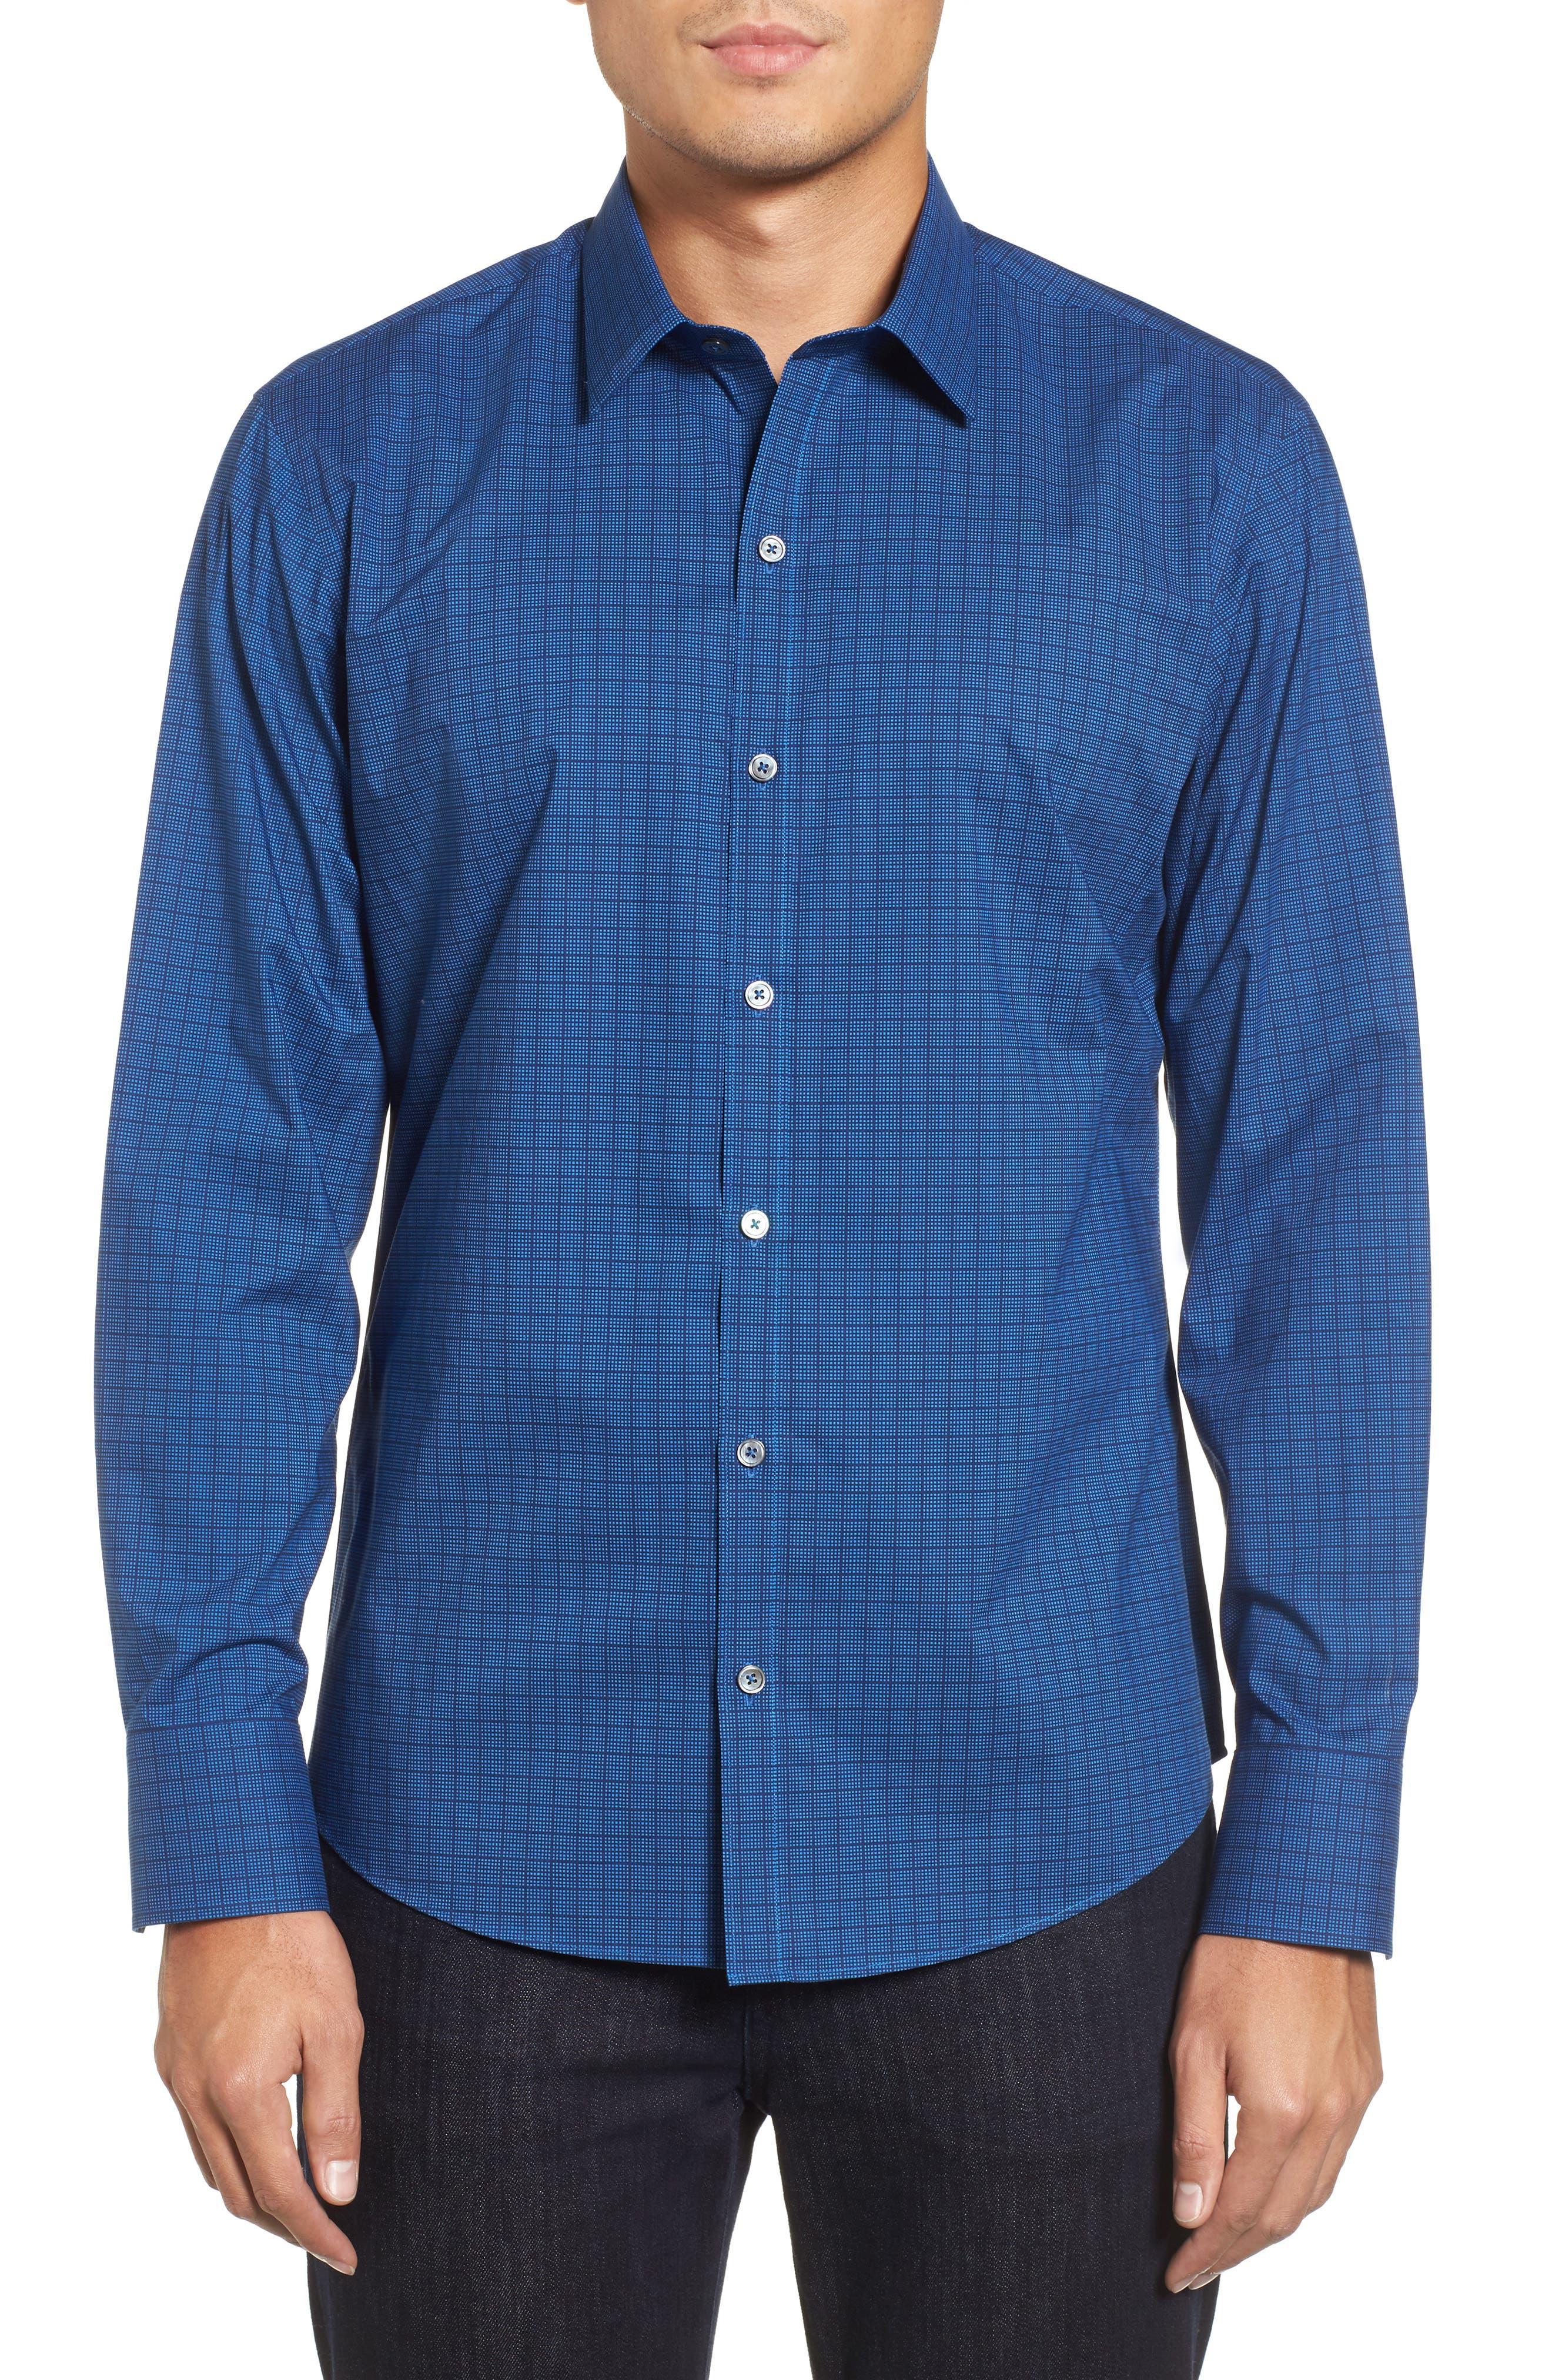 ZACHARY PRELL Harper Slim Fit Tile Print Sport Shirt in Navy